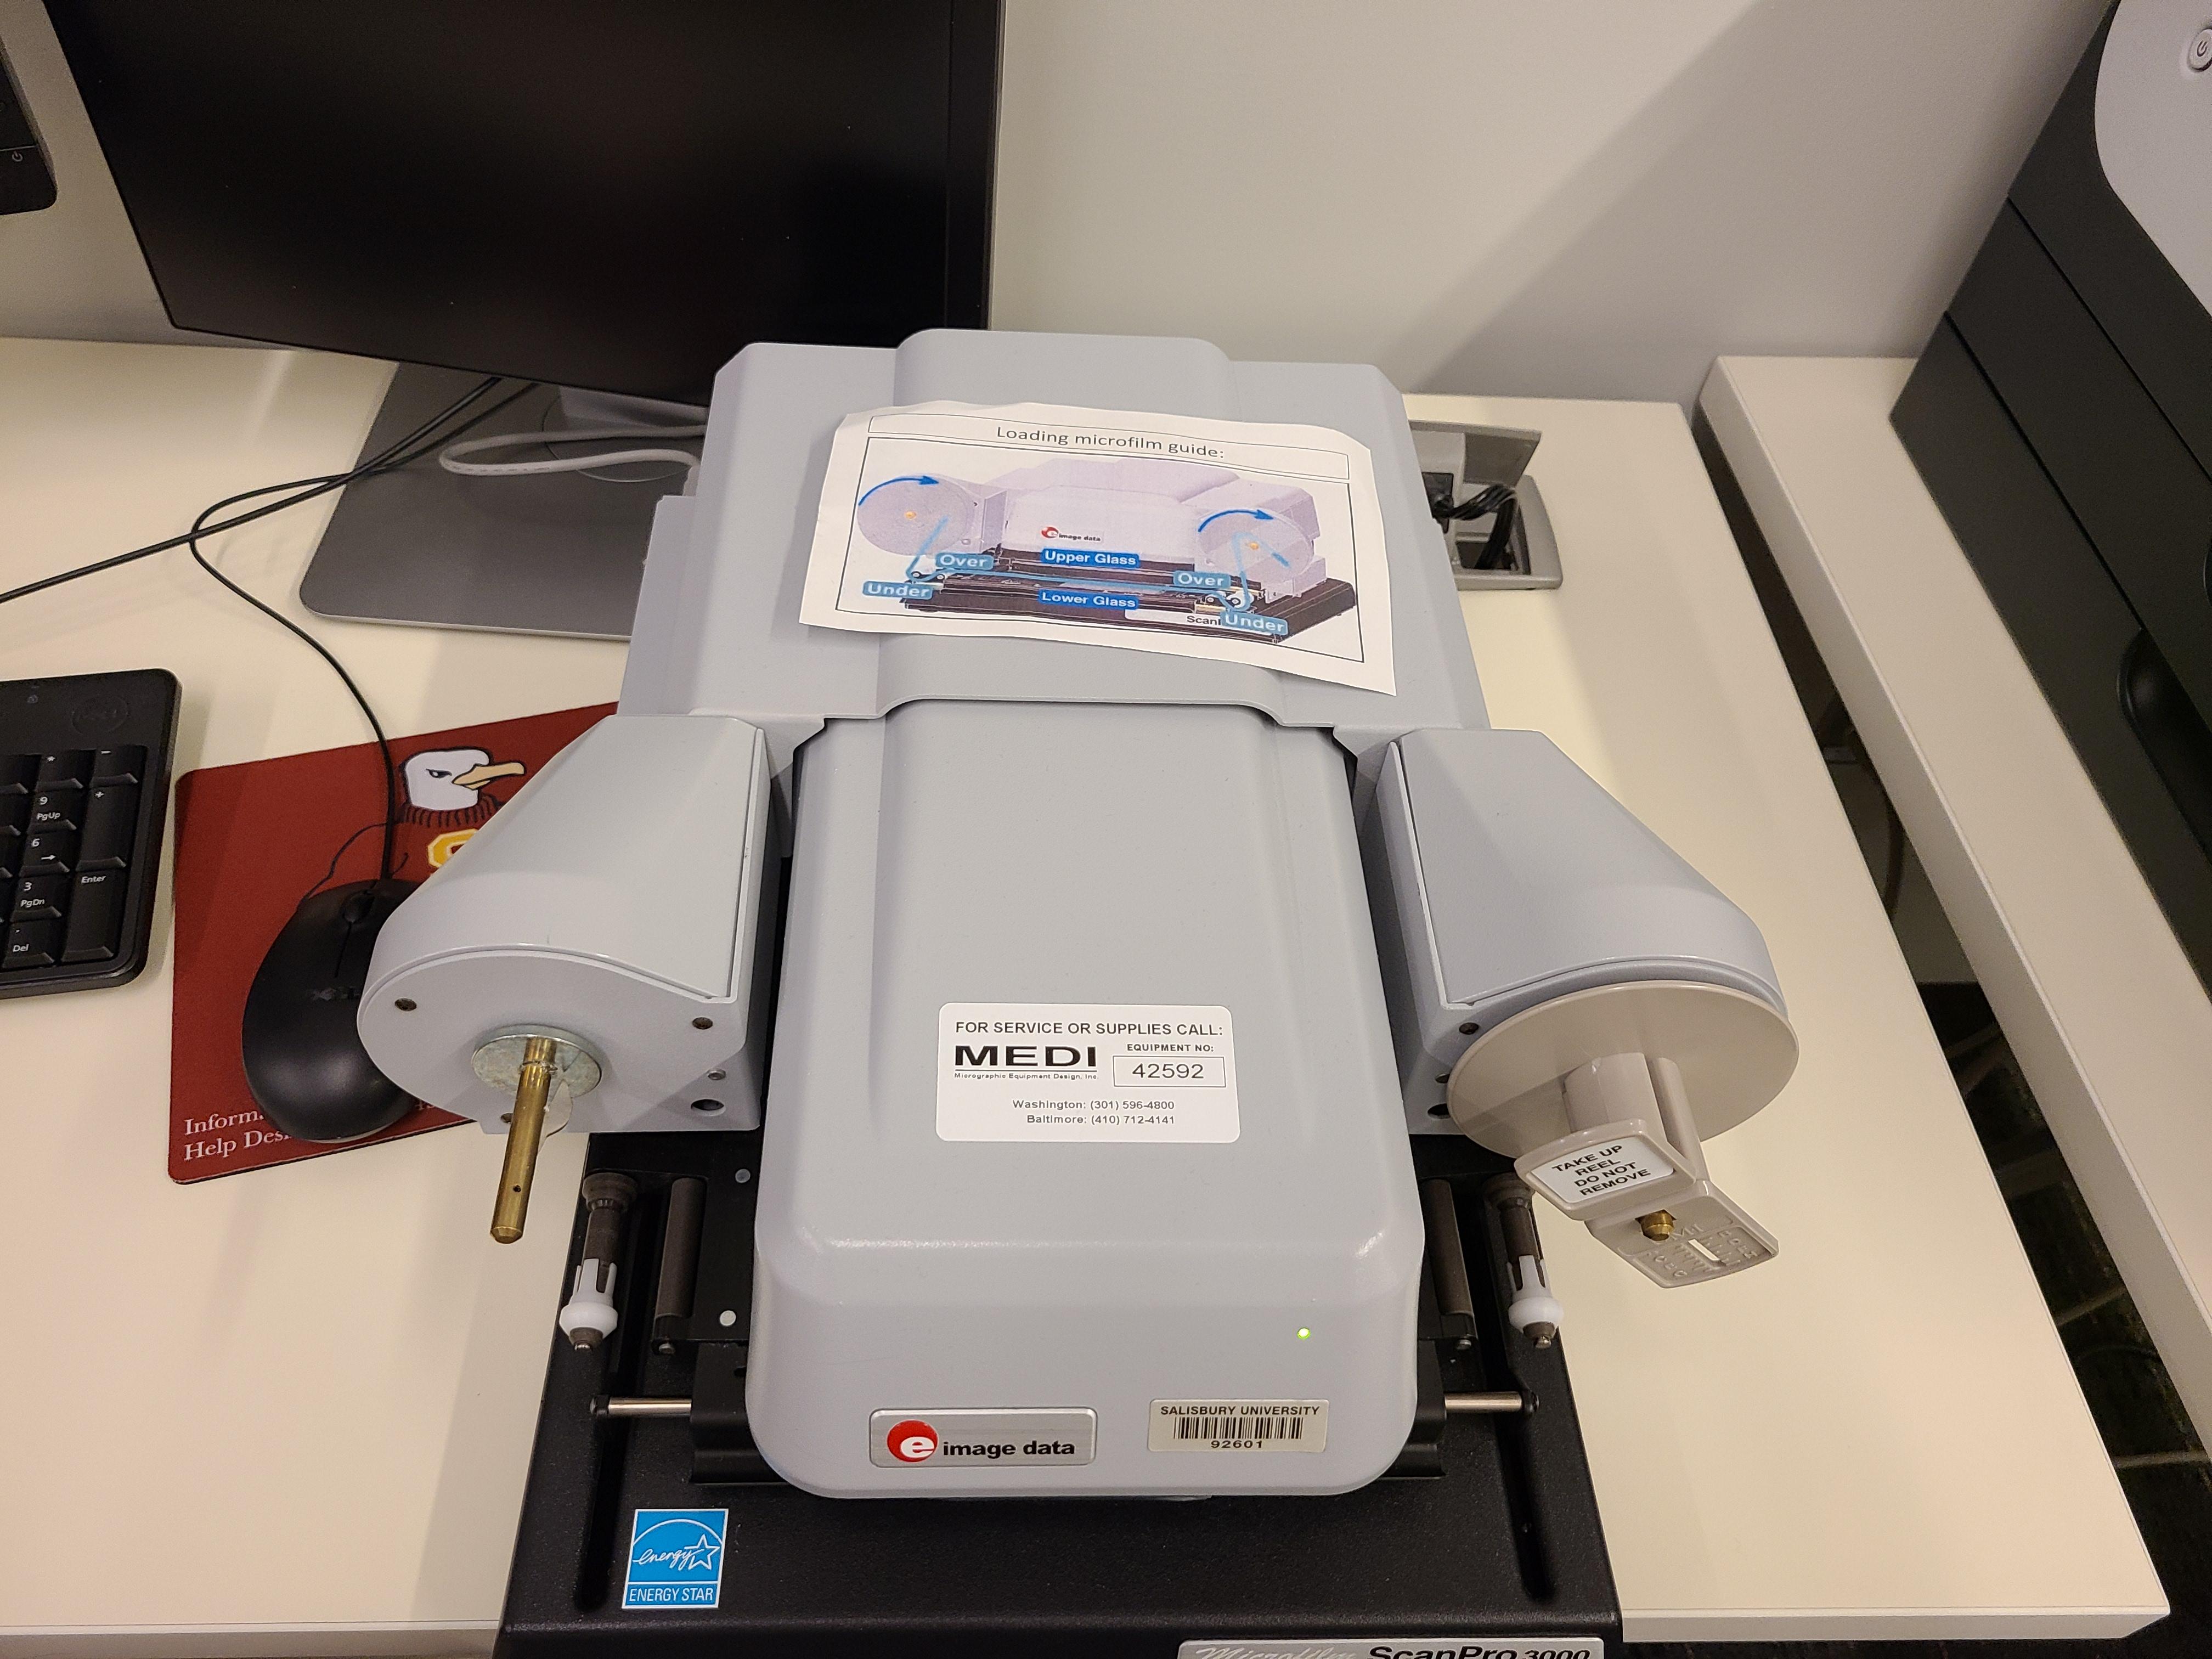 Microform Printer/Scanners